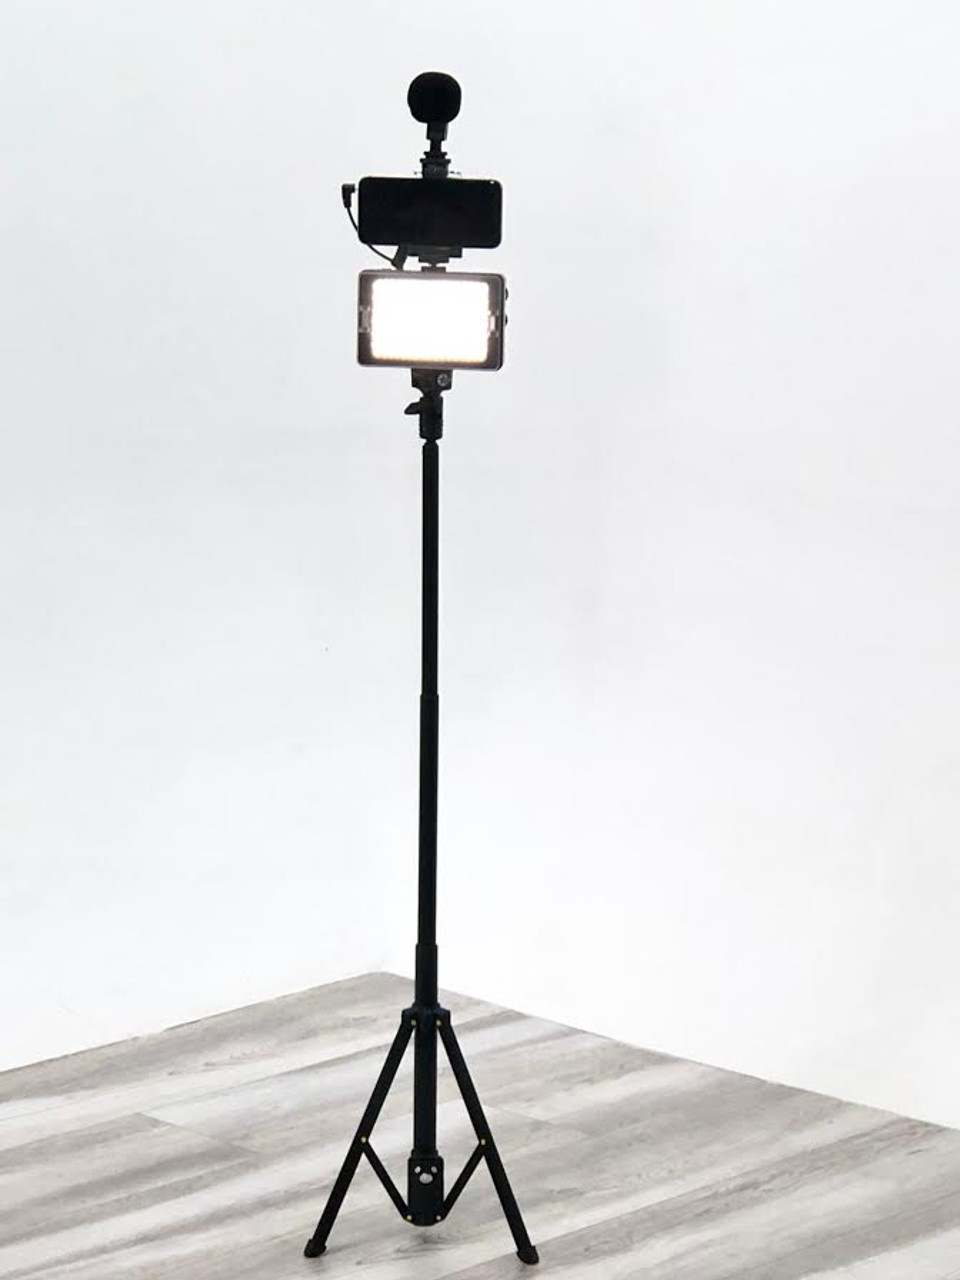 Stellar Versa Super Plus  LED Light Block Kit with Ajustable Tripod